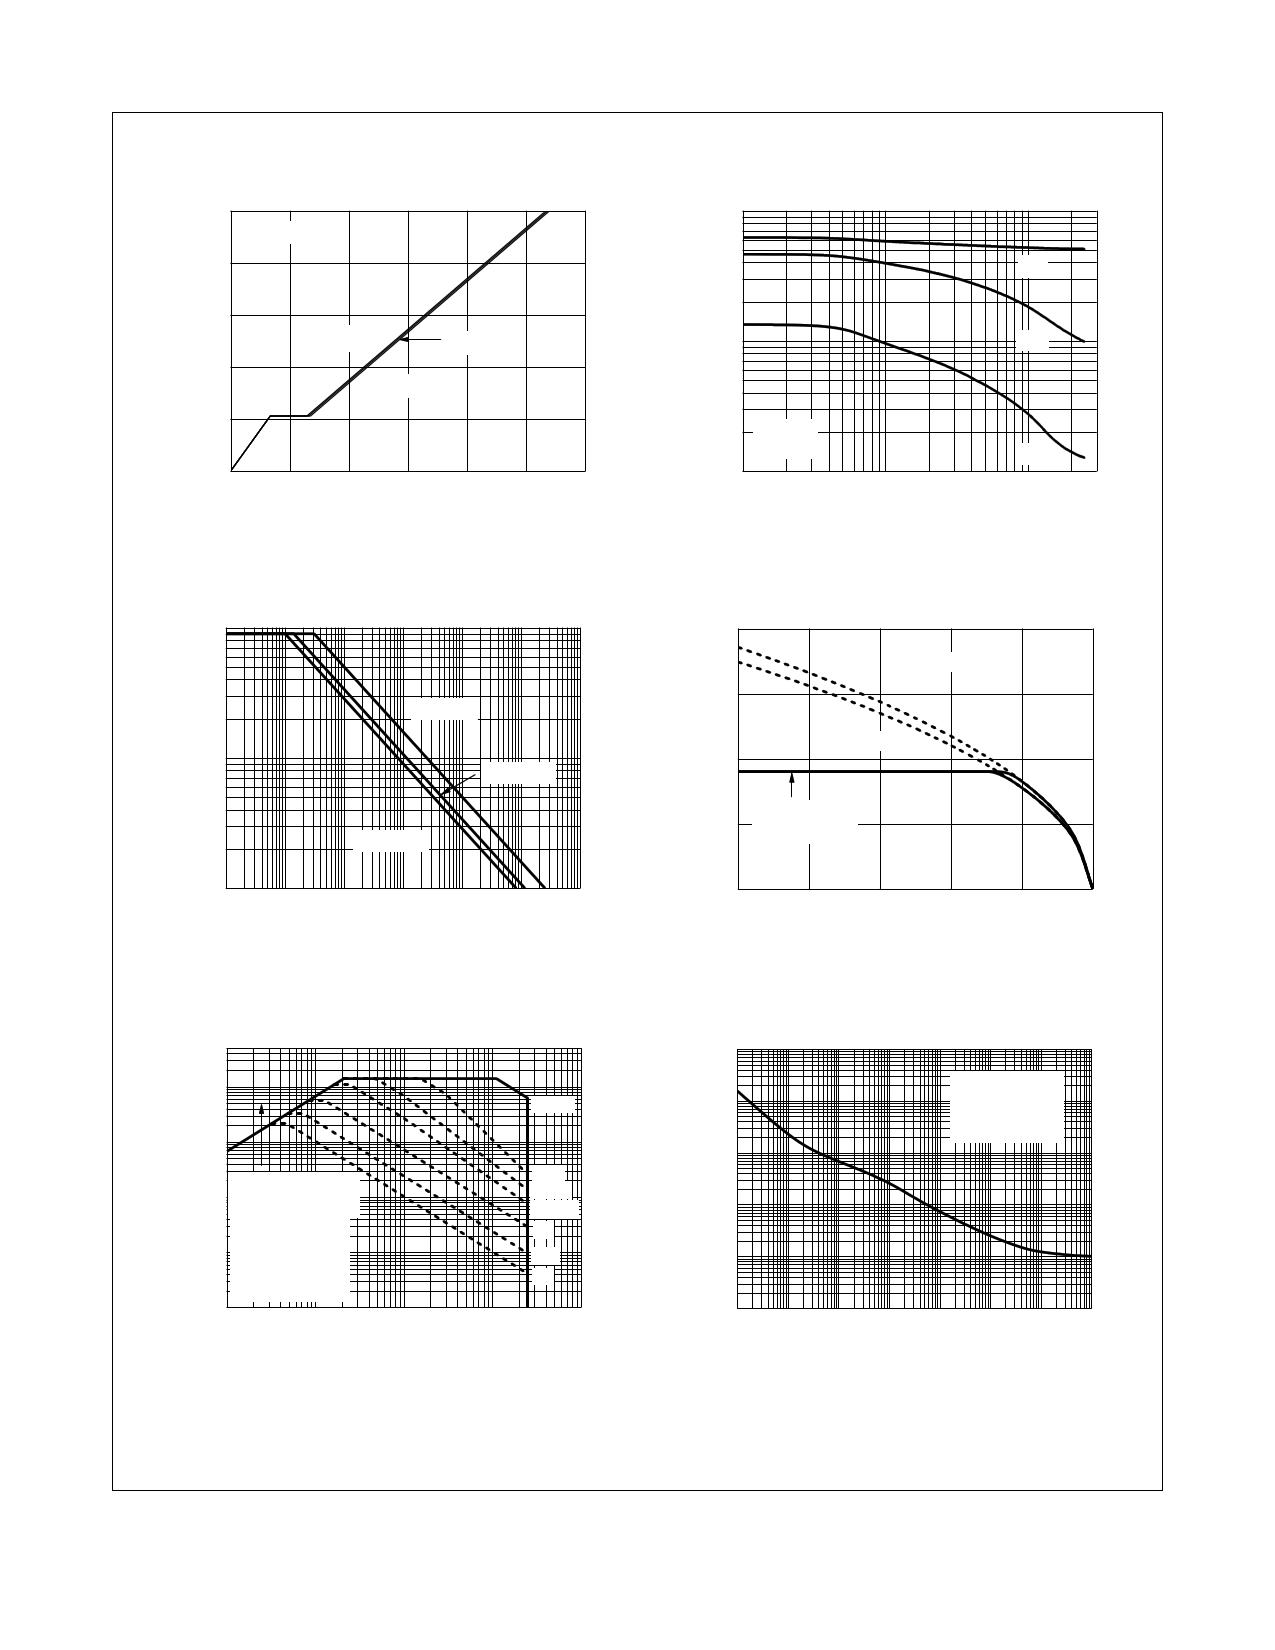 FDMS8558S pdf, 반도체, 판매, 대치품